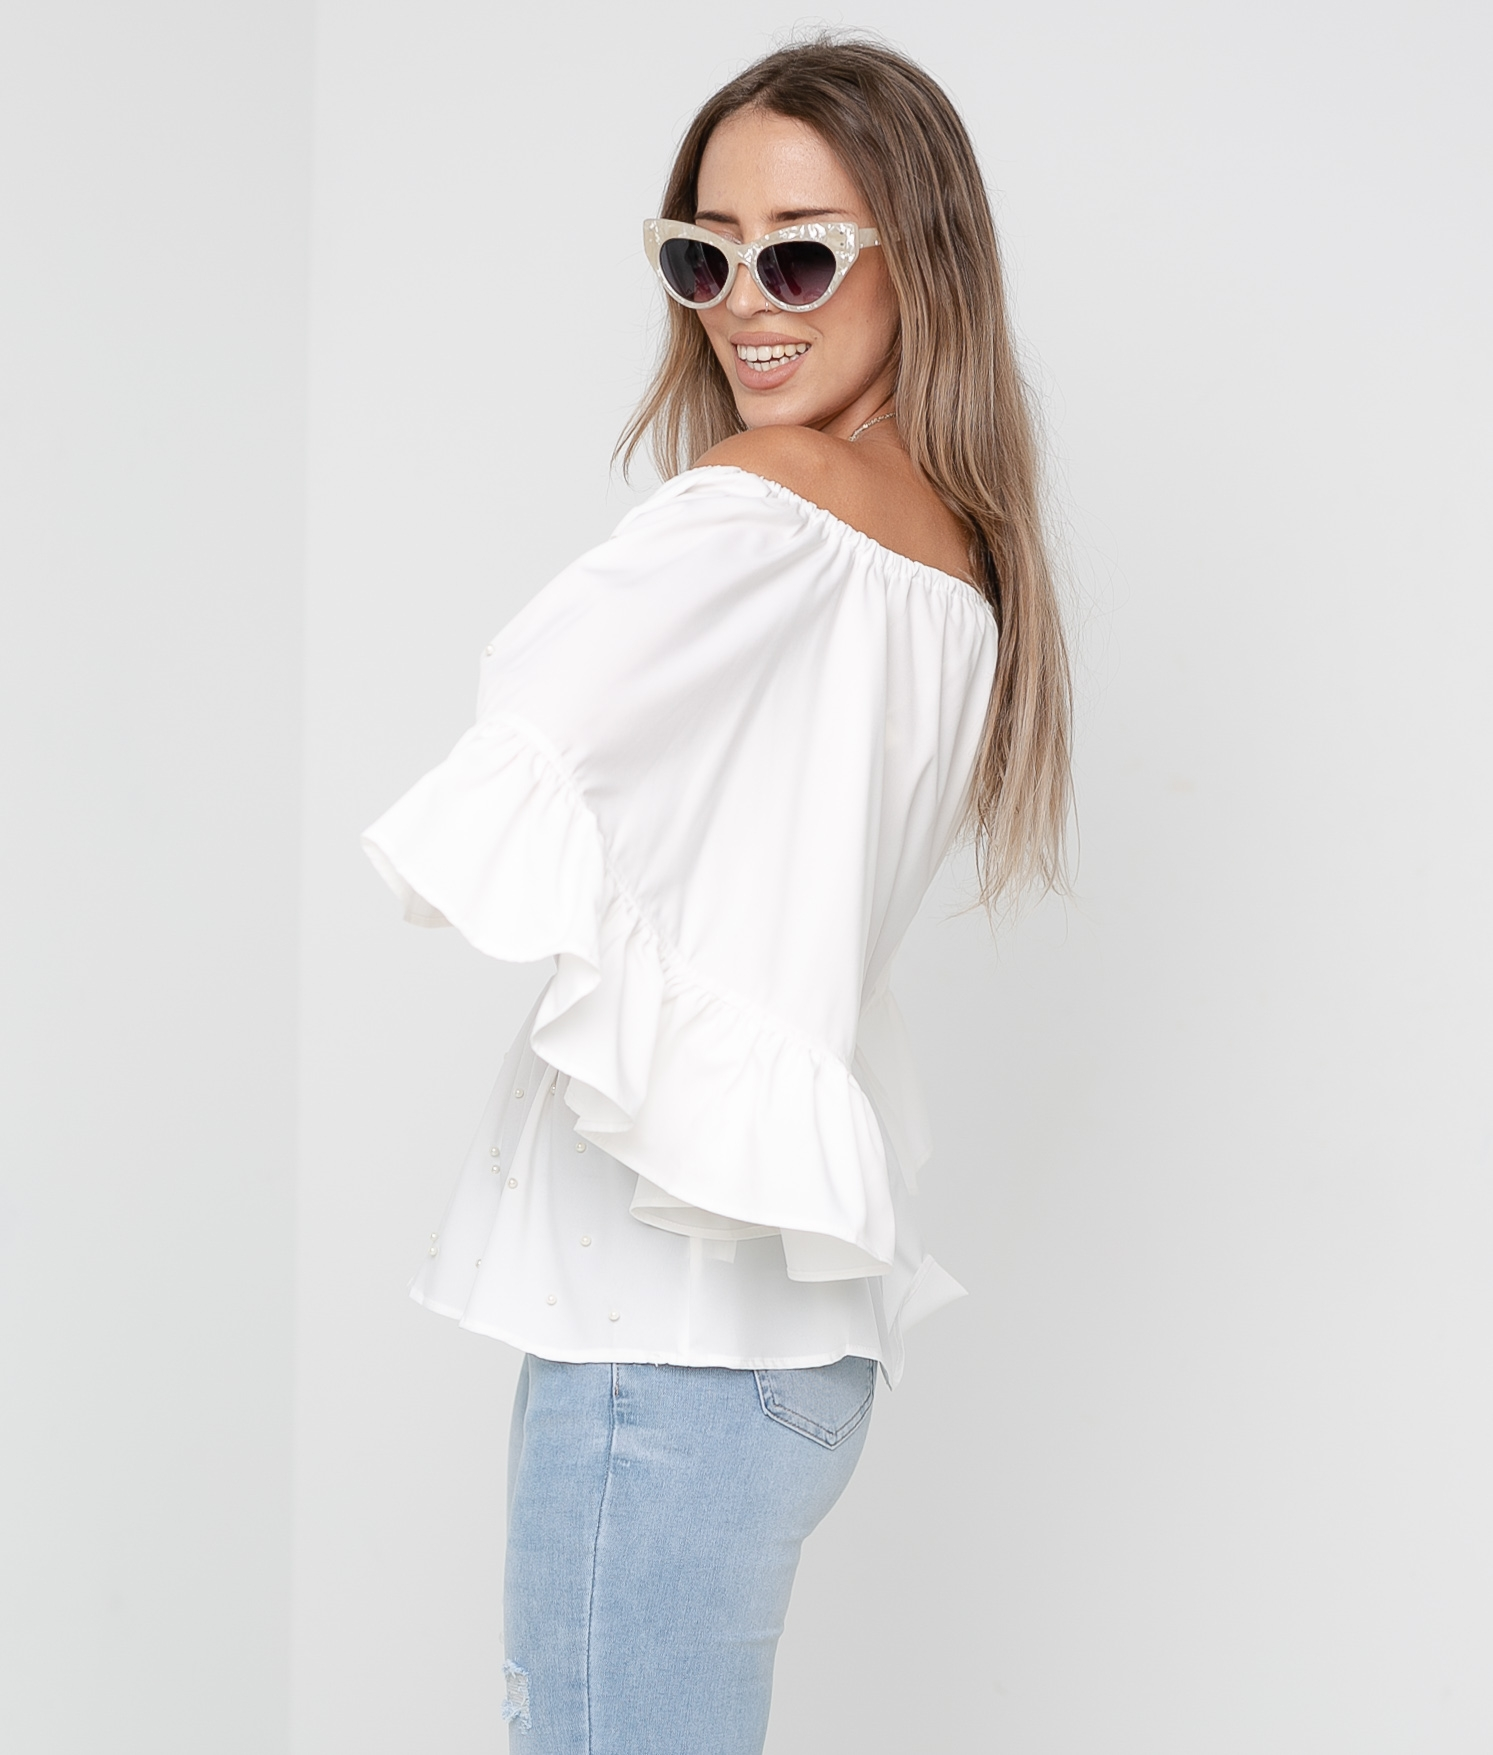 Blusa Perlani - WHITE